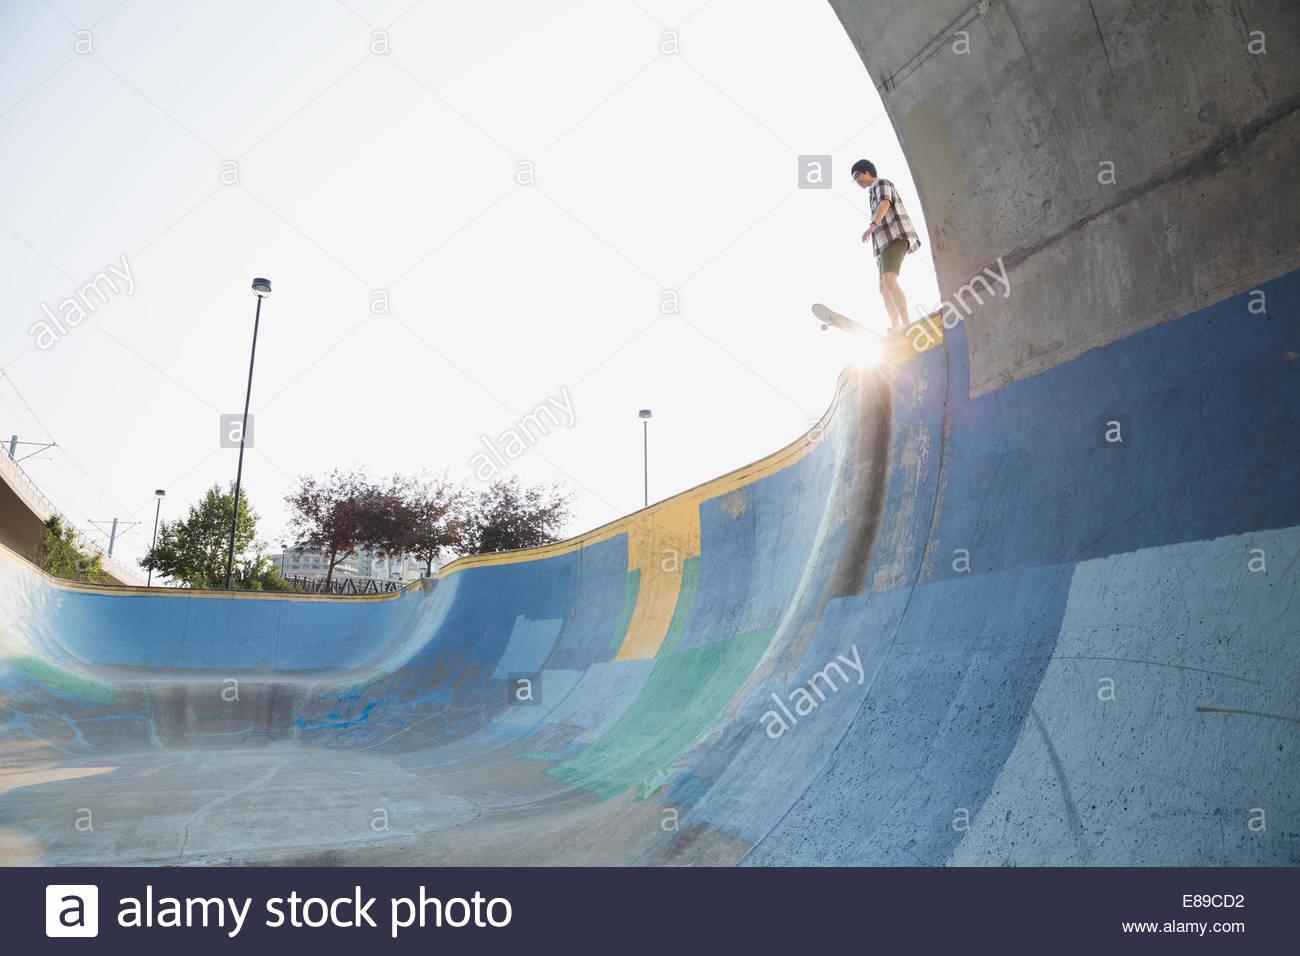 Teenage boy on ramp at skateboard park - Stock Image